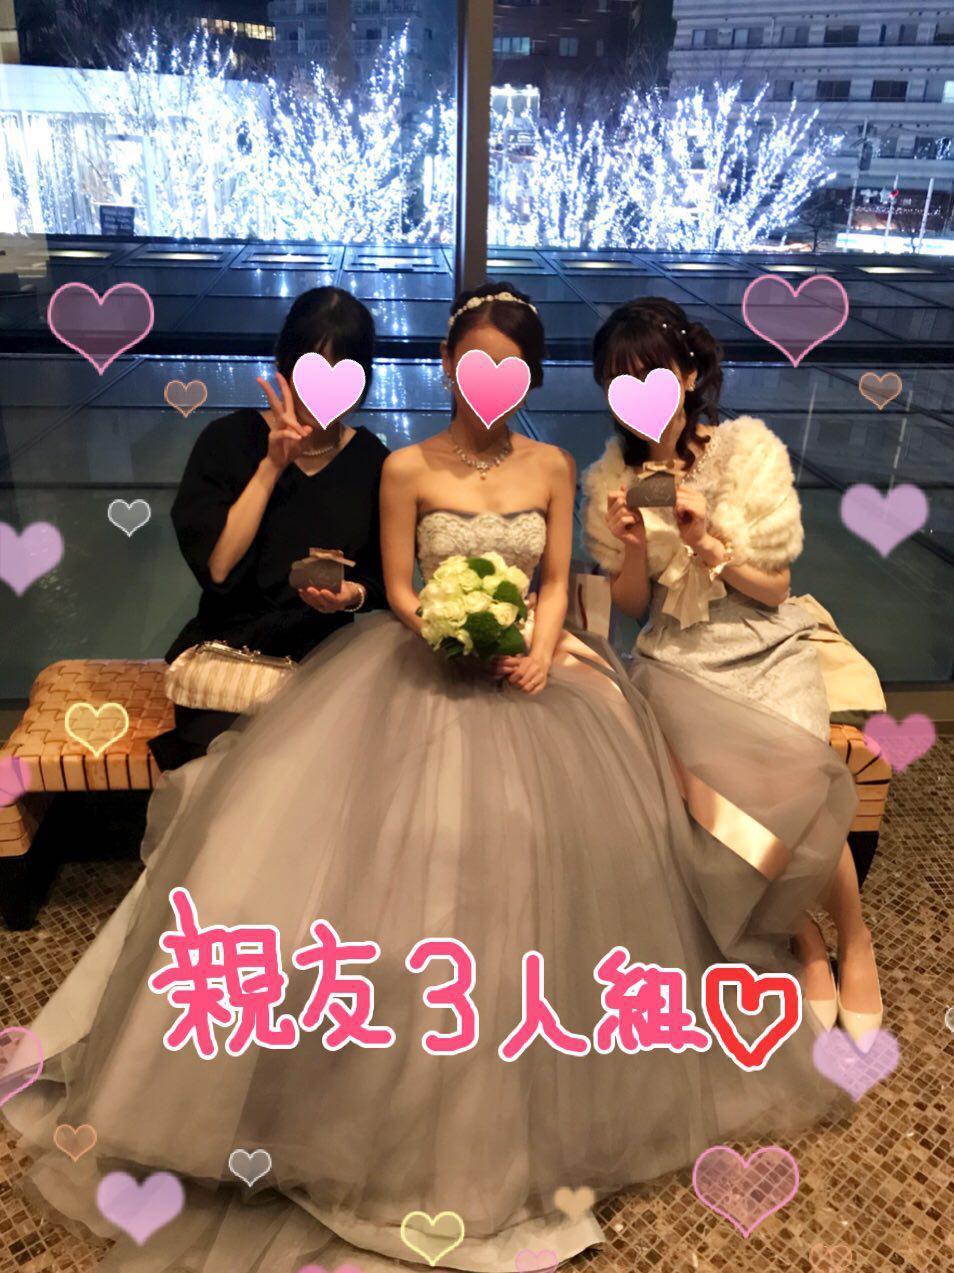 photo_2017-12-17_00-21-53.jpg